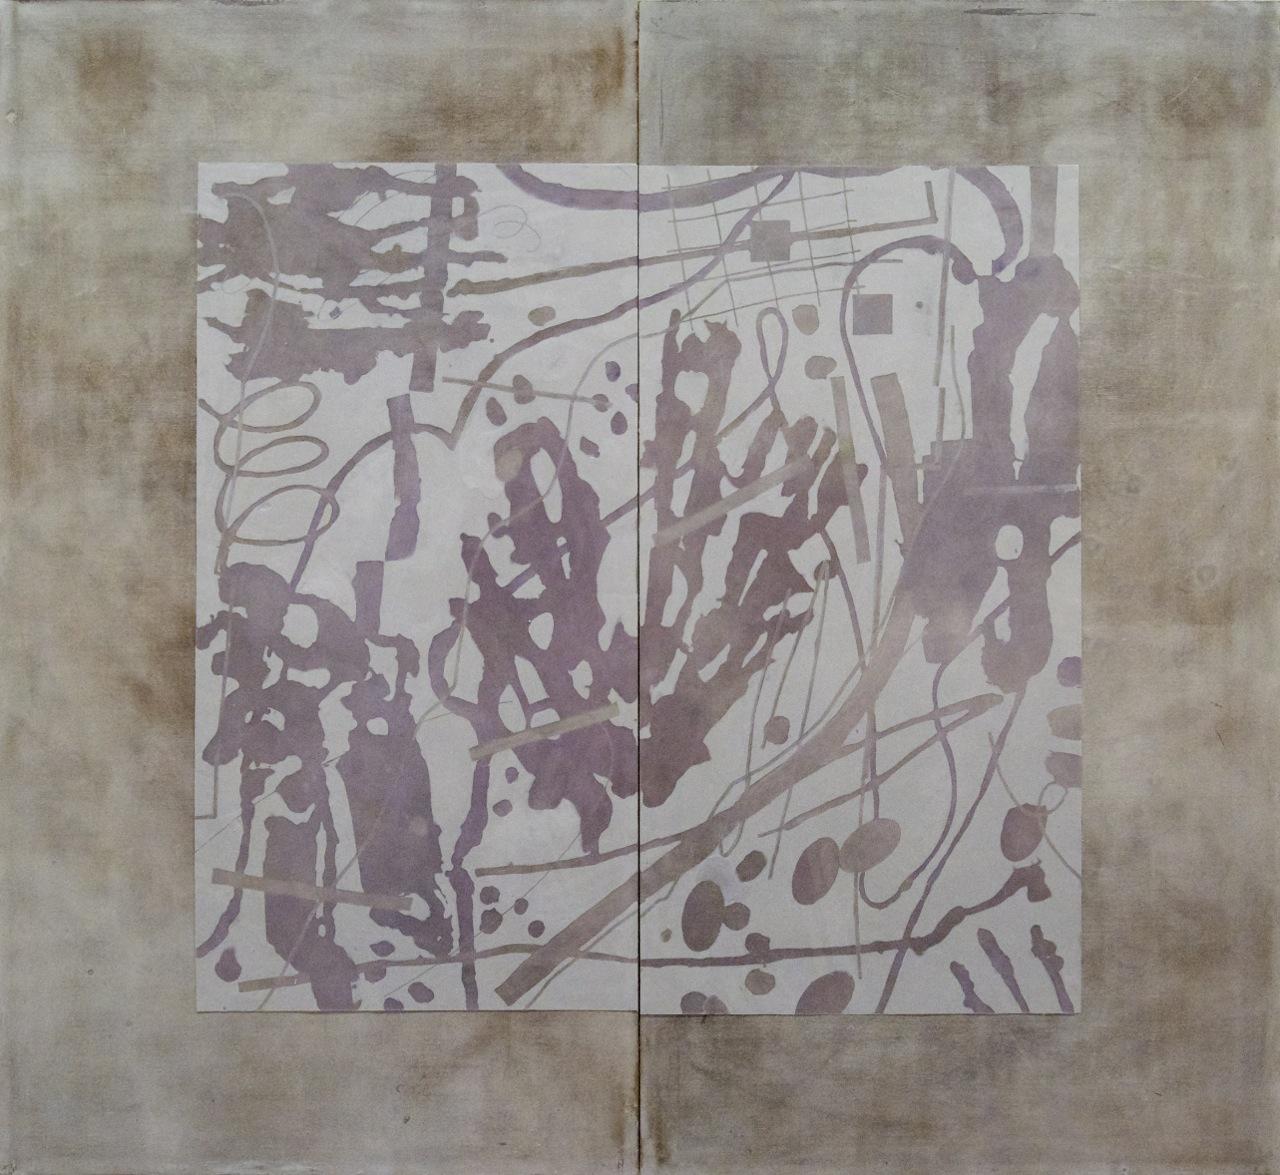 Peter Flaccus, Shadow, 2013, encausto su tavola, cm 183x200